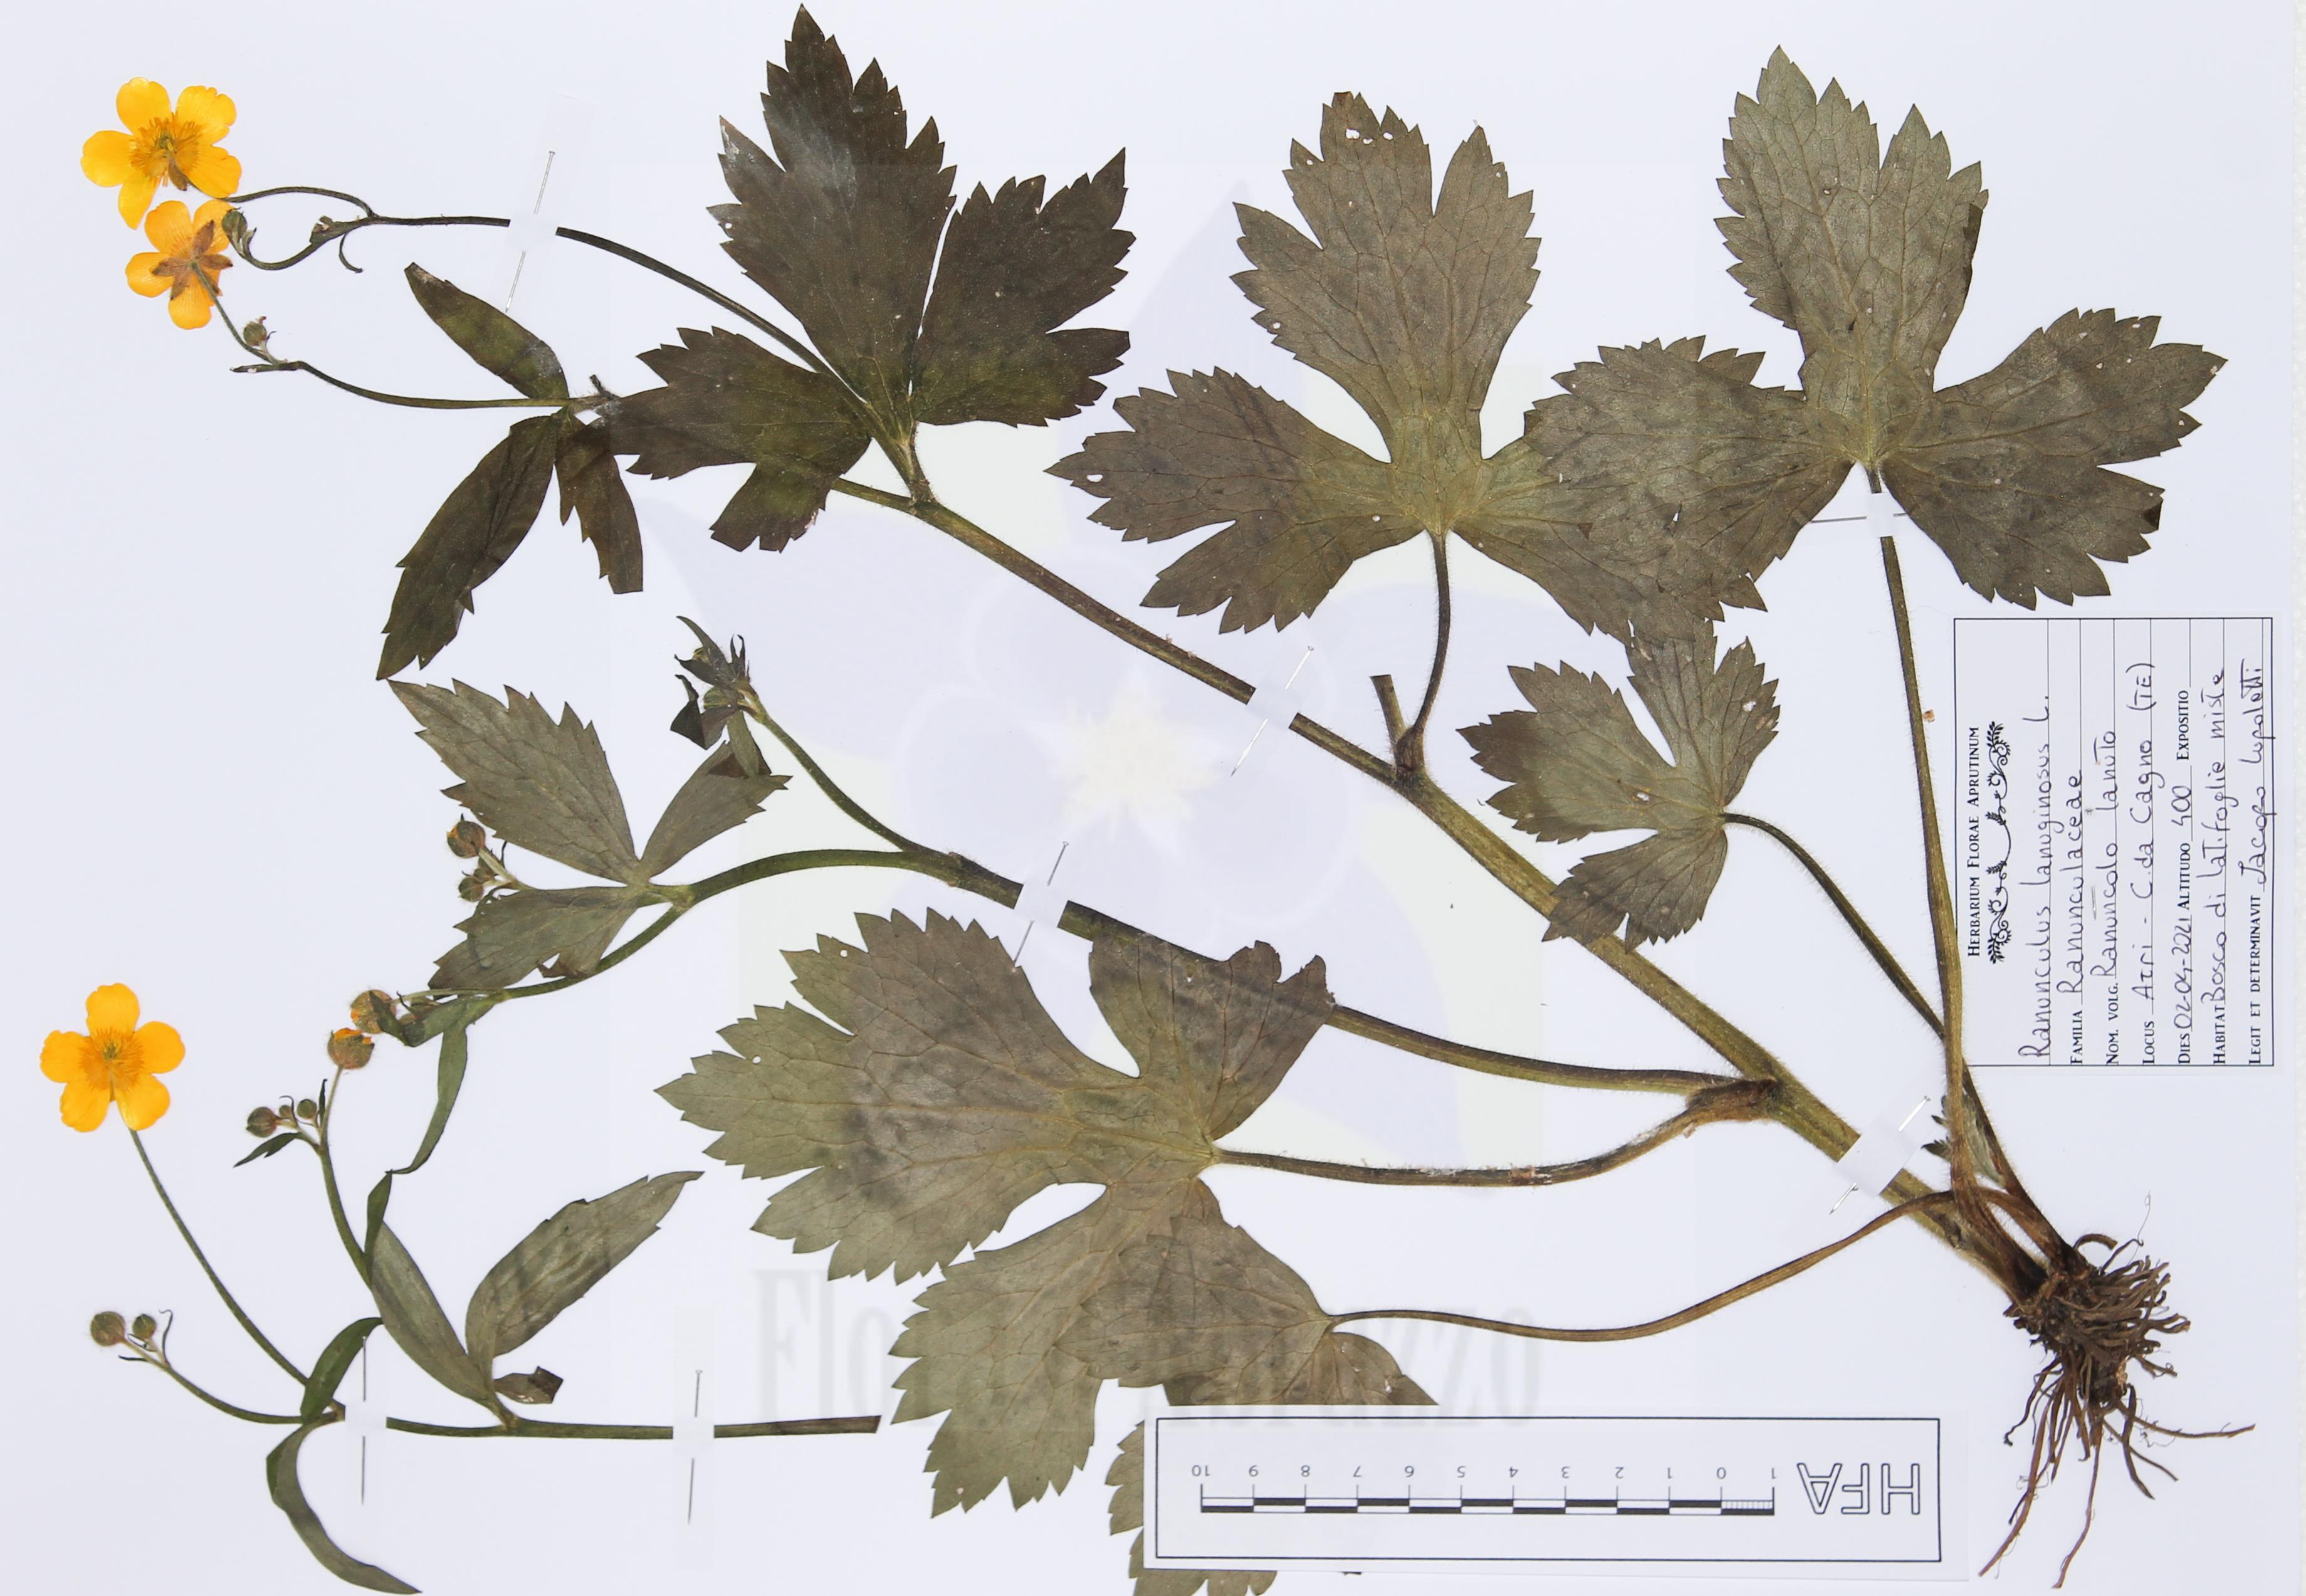 Ranunculus lanuginosusL.